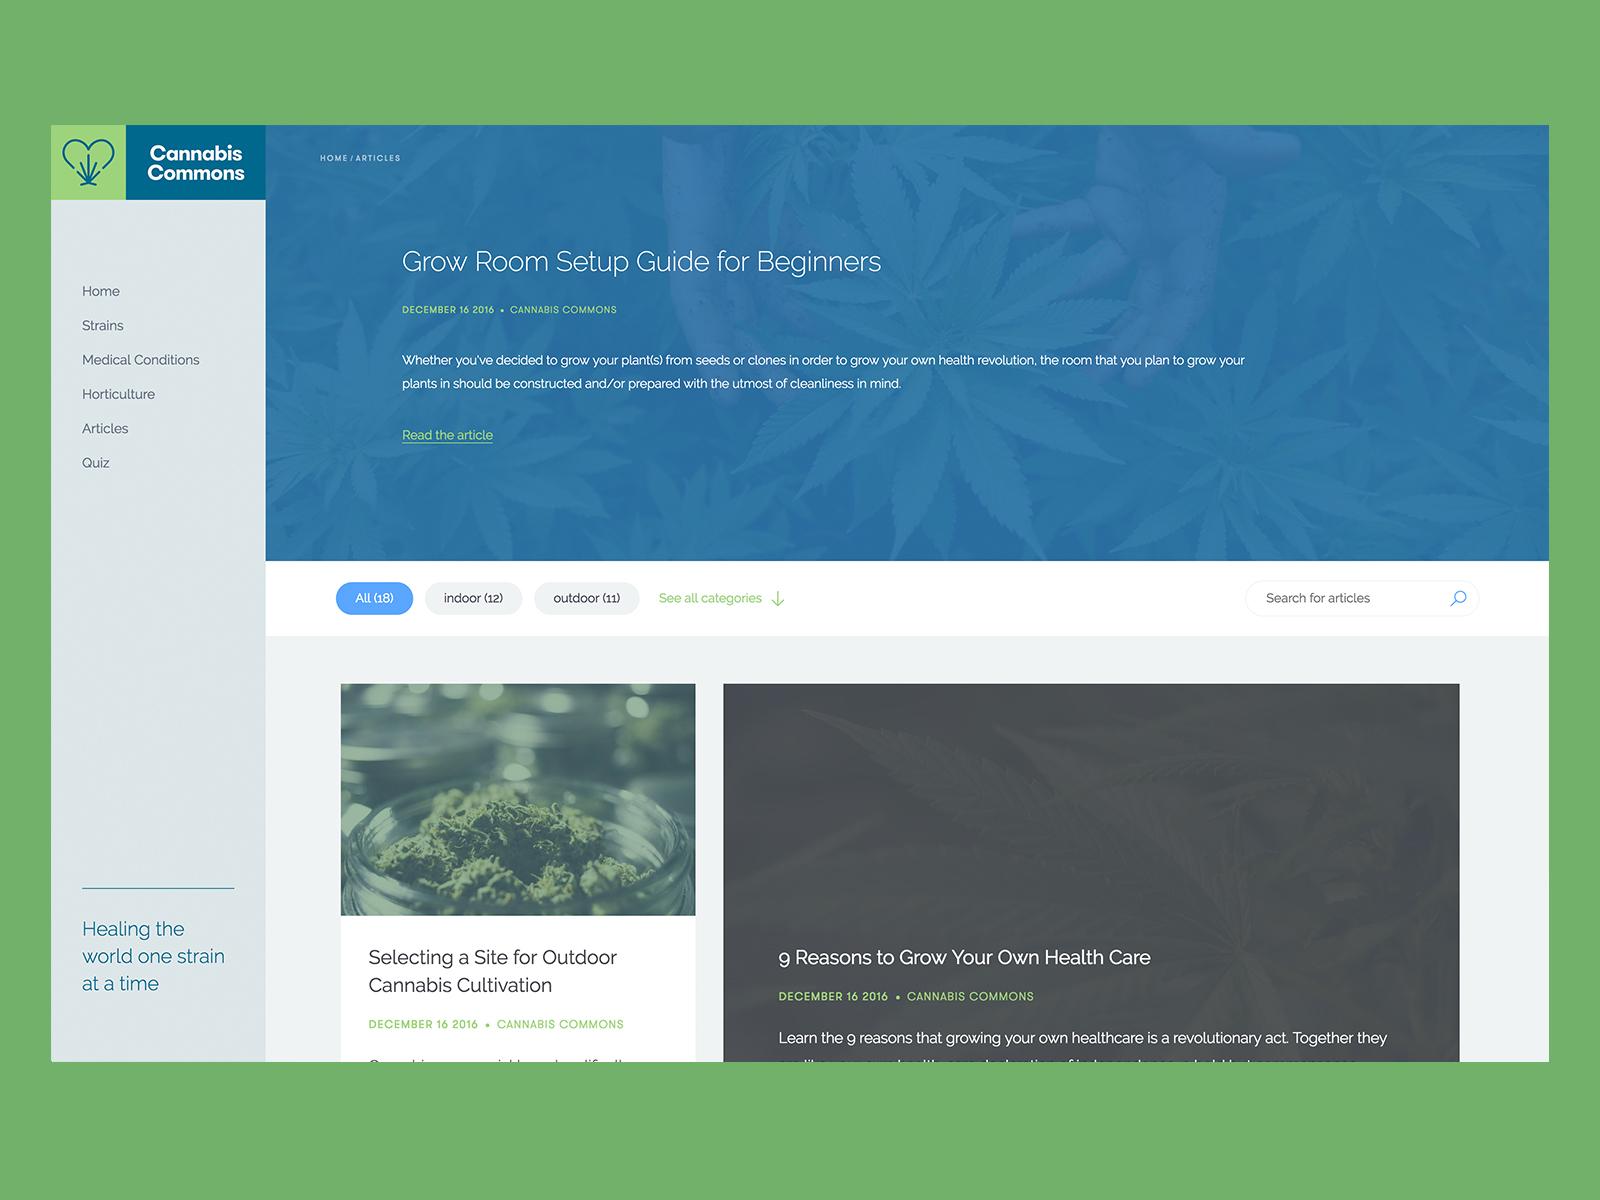 Cannabis Commons - Blog